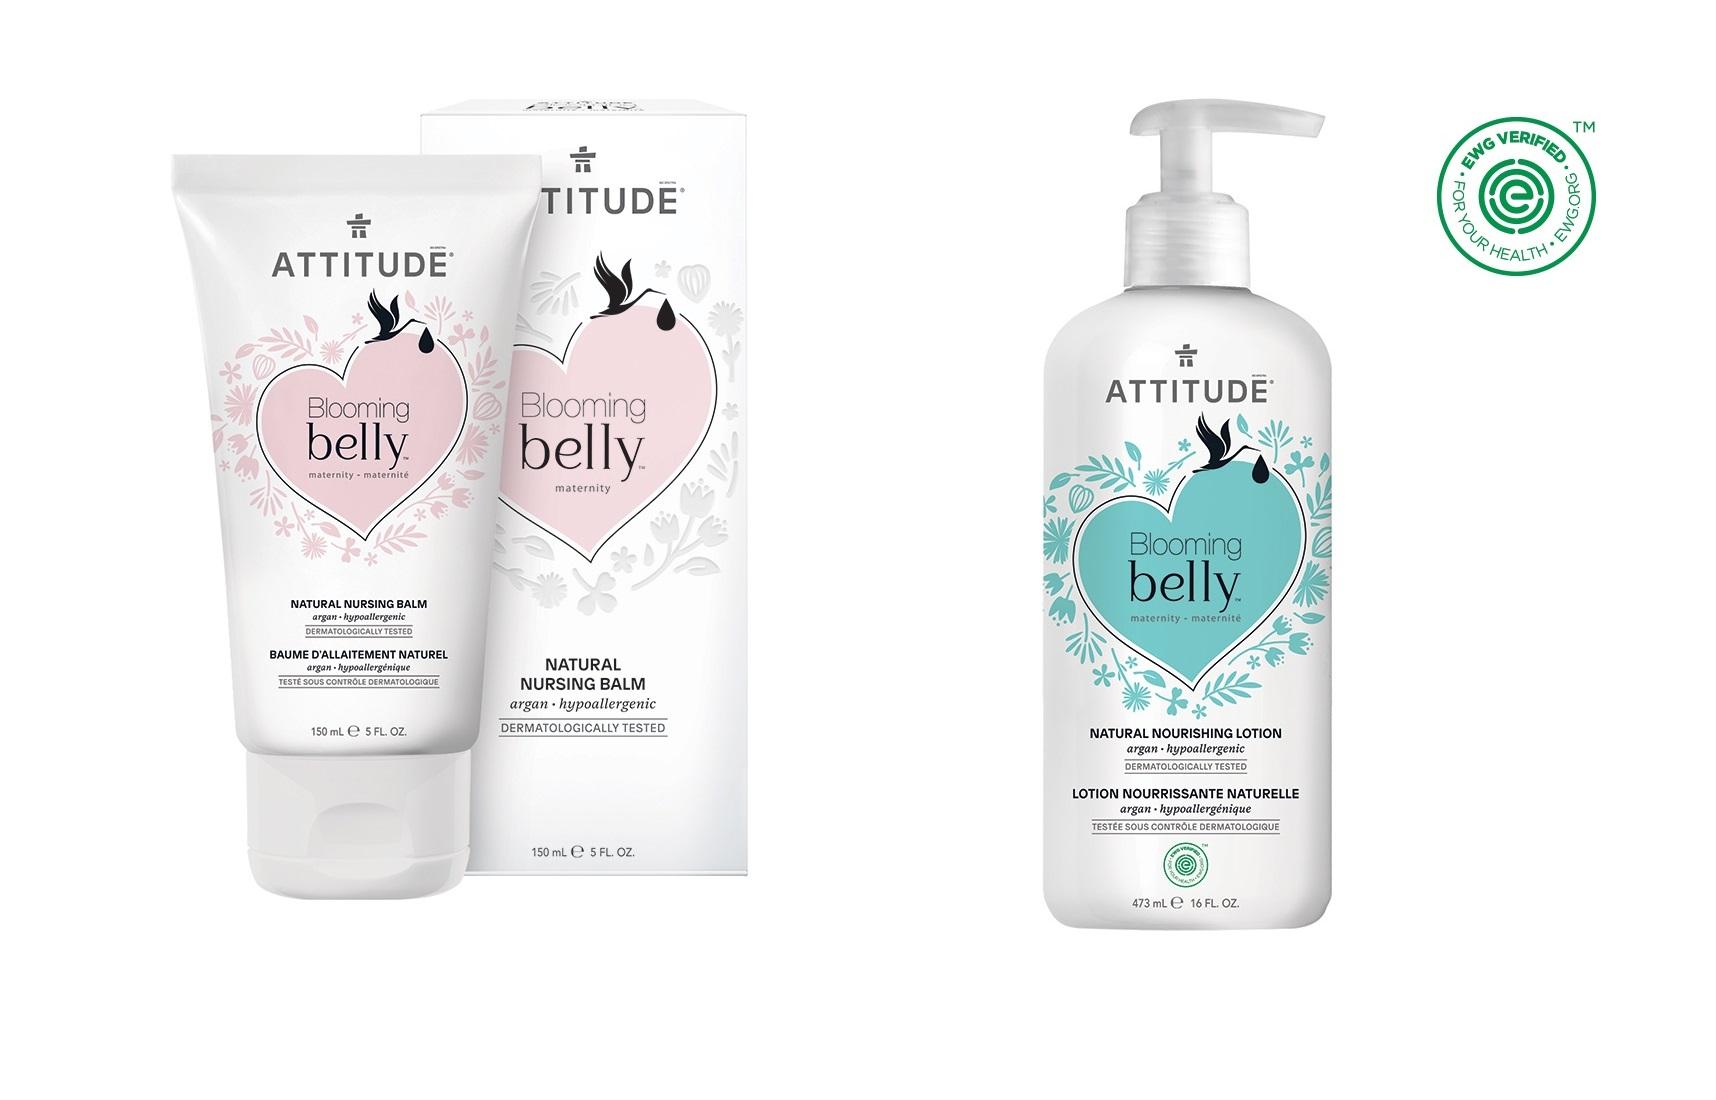 Kosmetika Attitude - řada pro těhotné BLOOMING BELLY